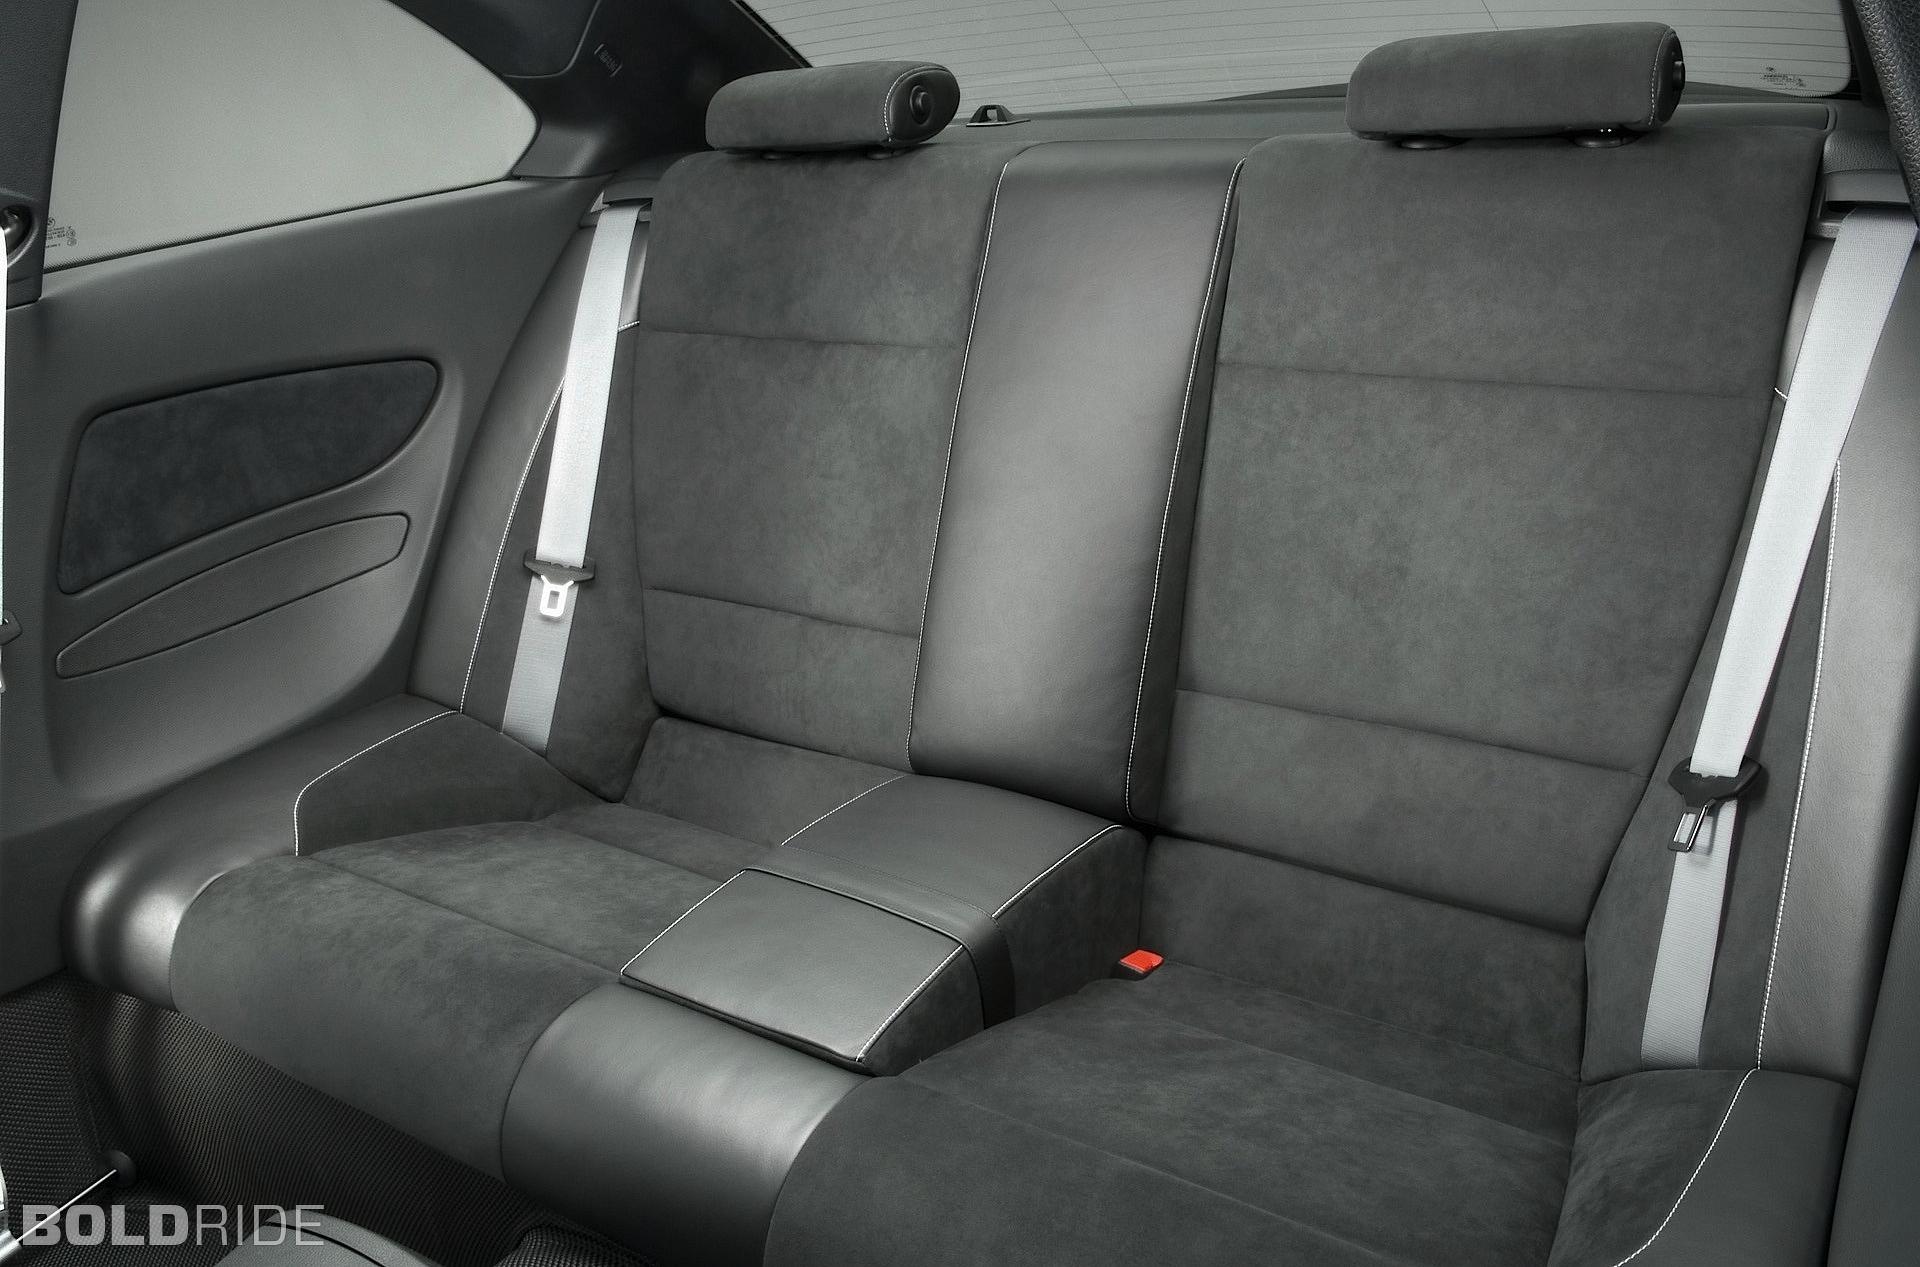 BMW Concept 1-Series tii